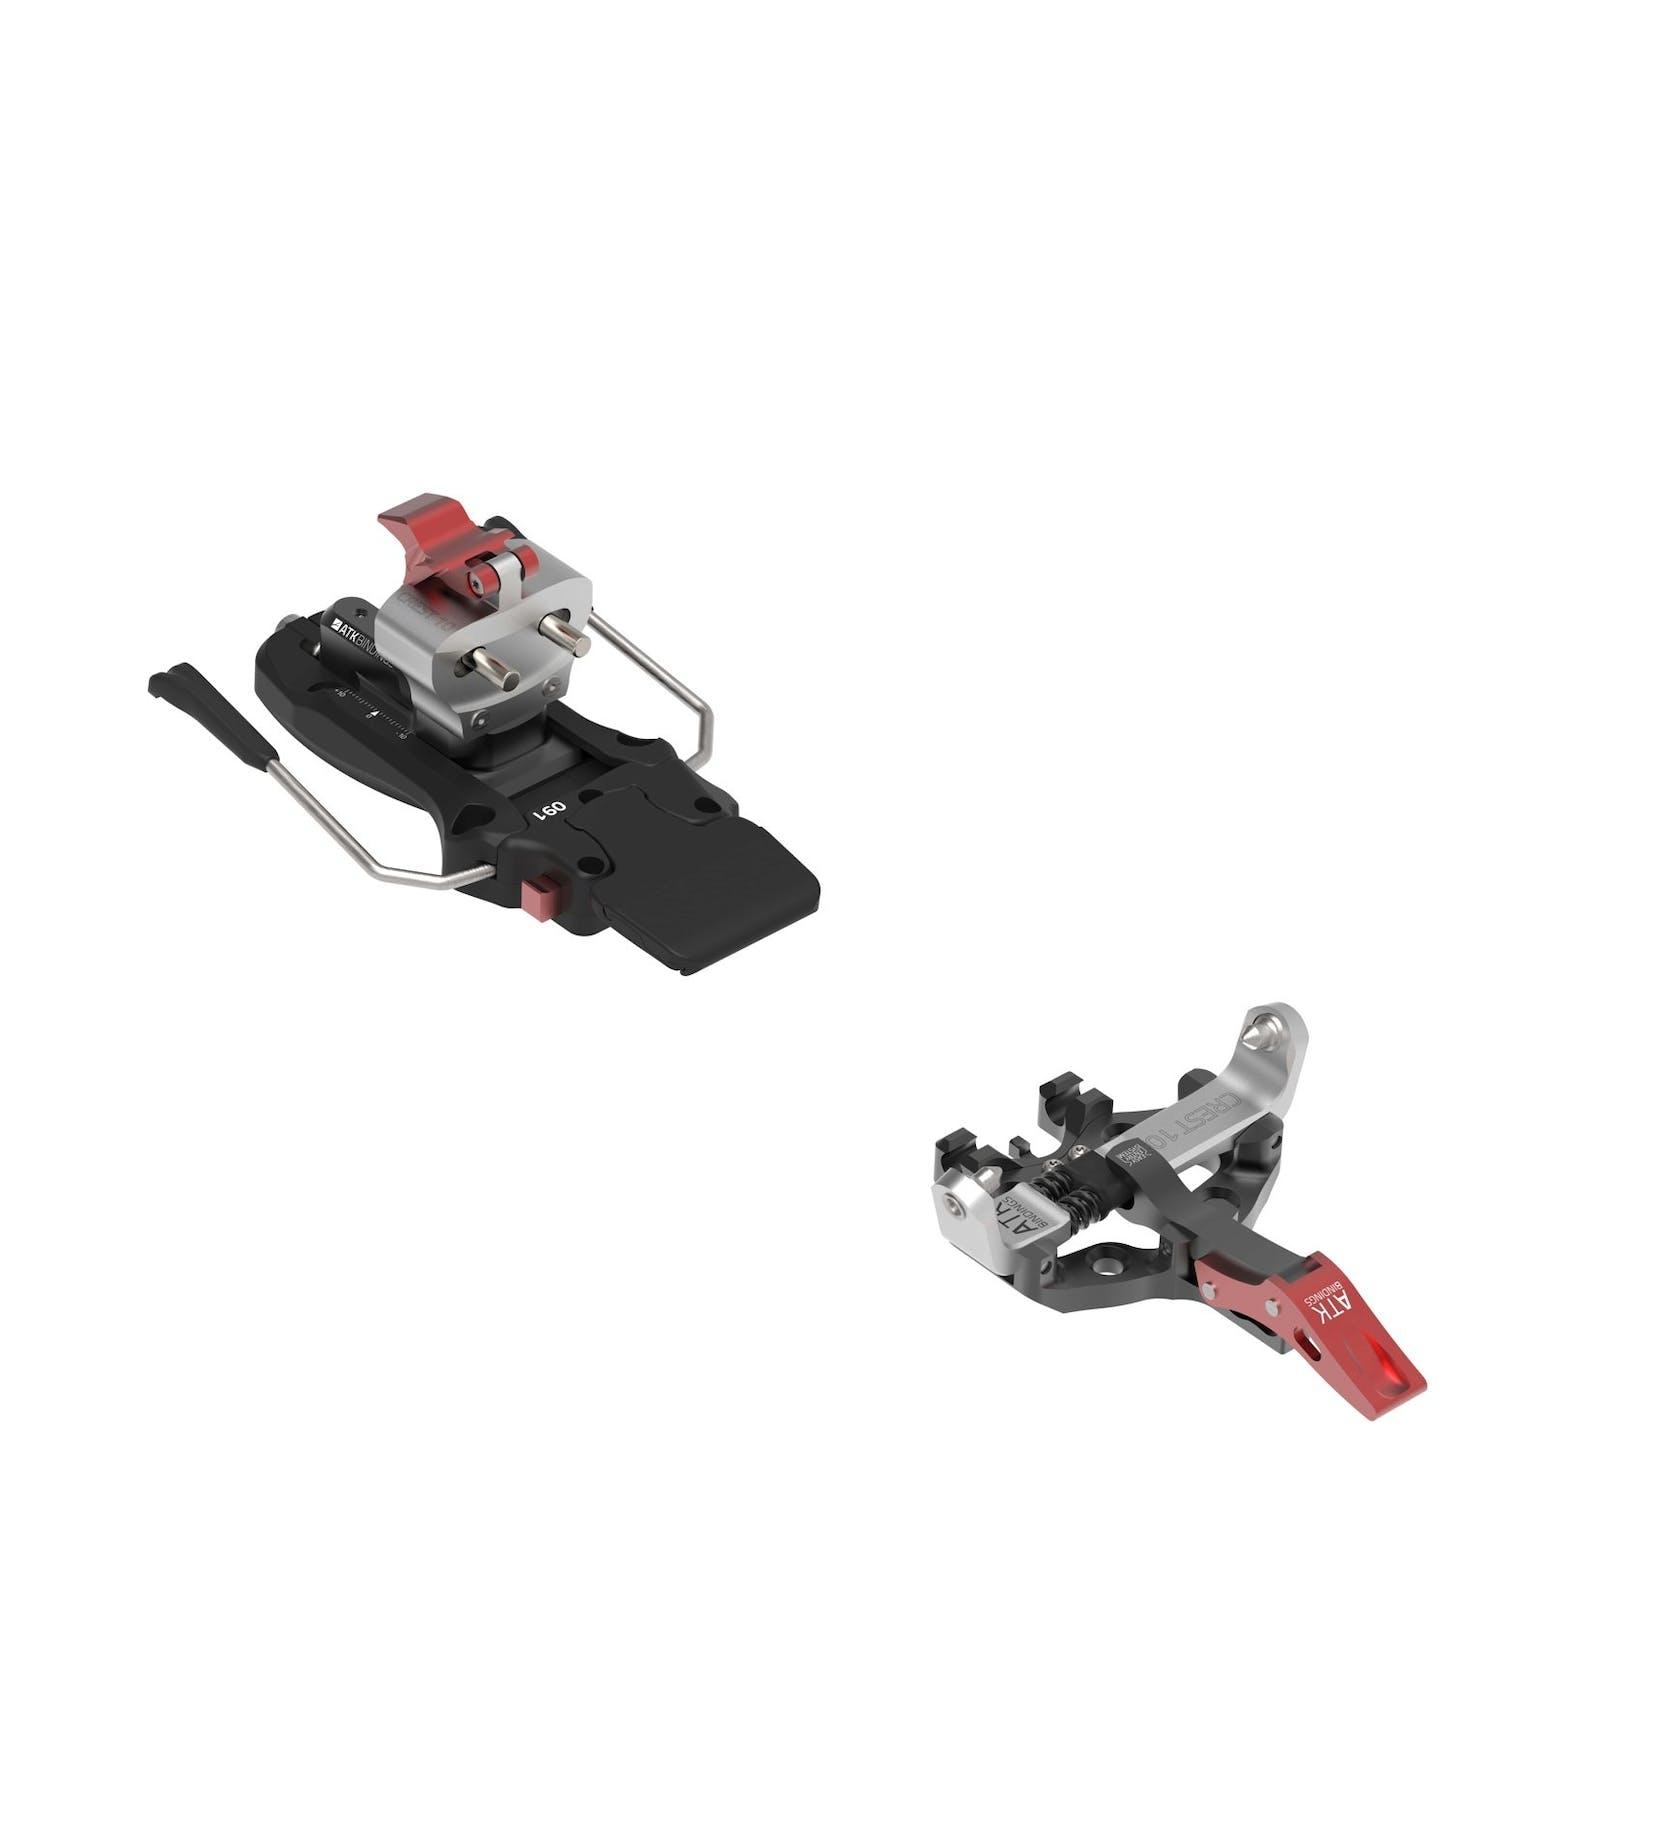 ATK Bindings Crest 10 (Ski brake 97 mm) - Skitourenbindung